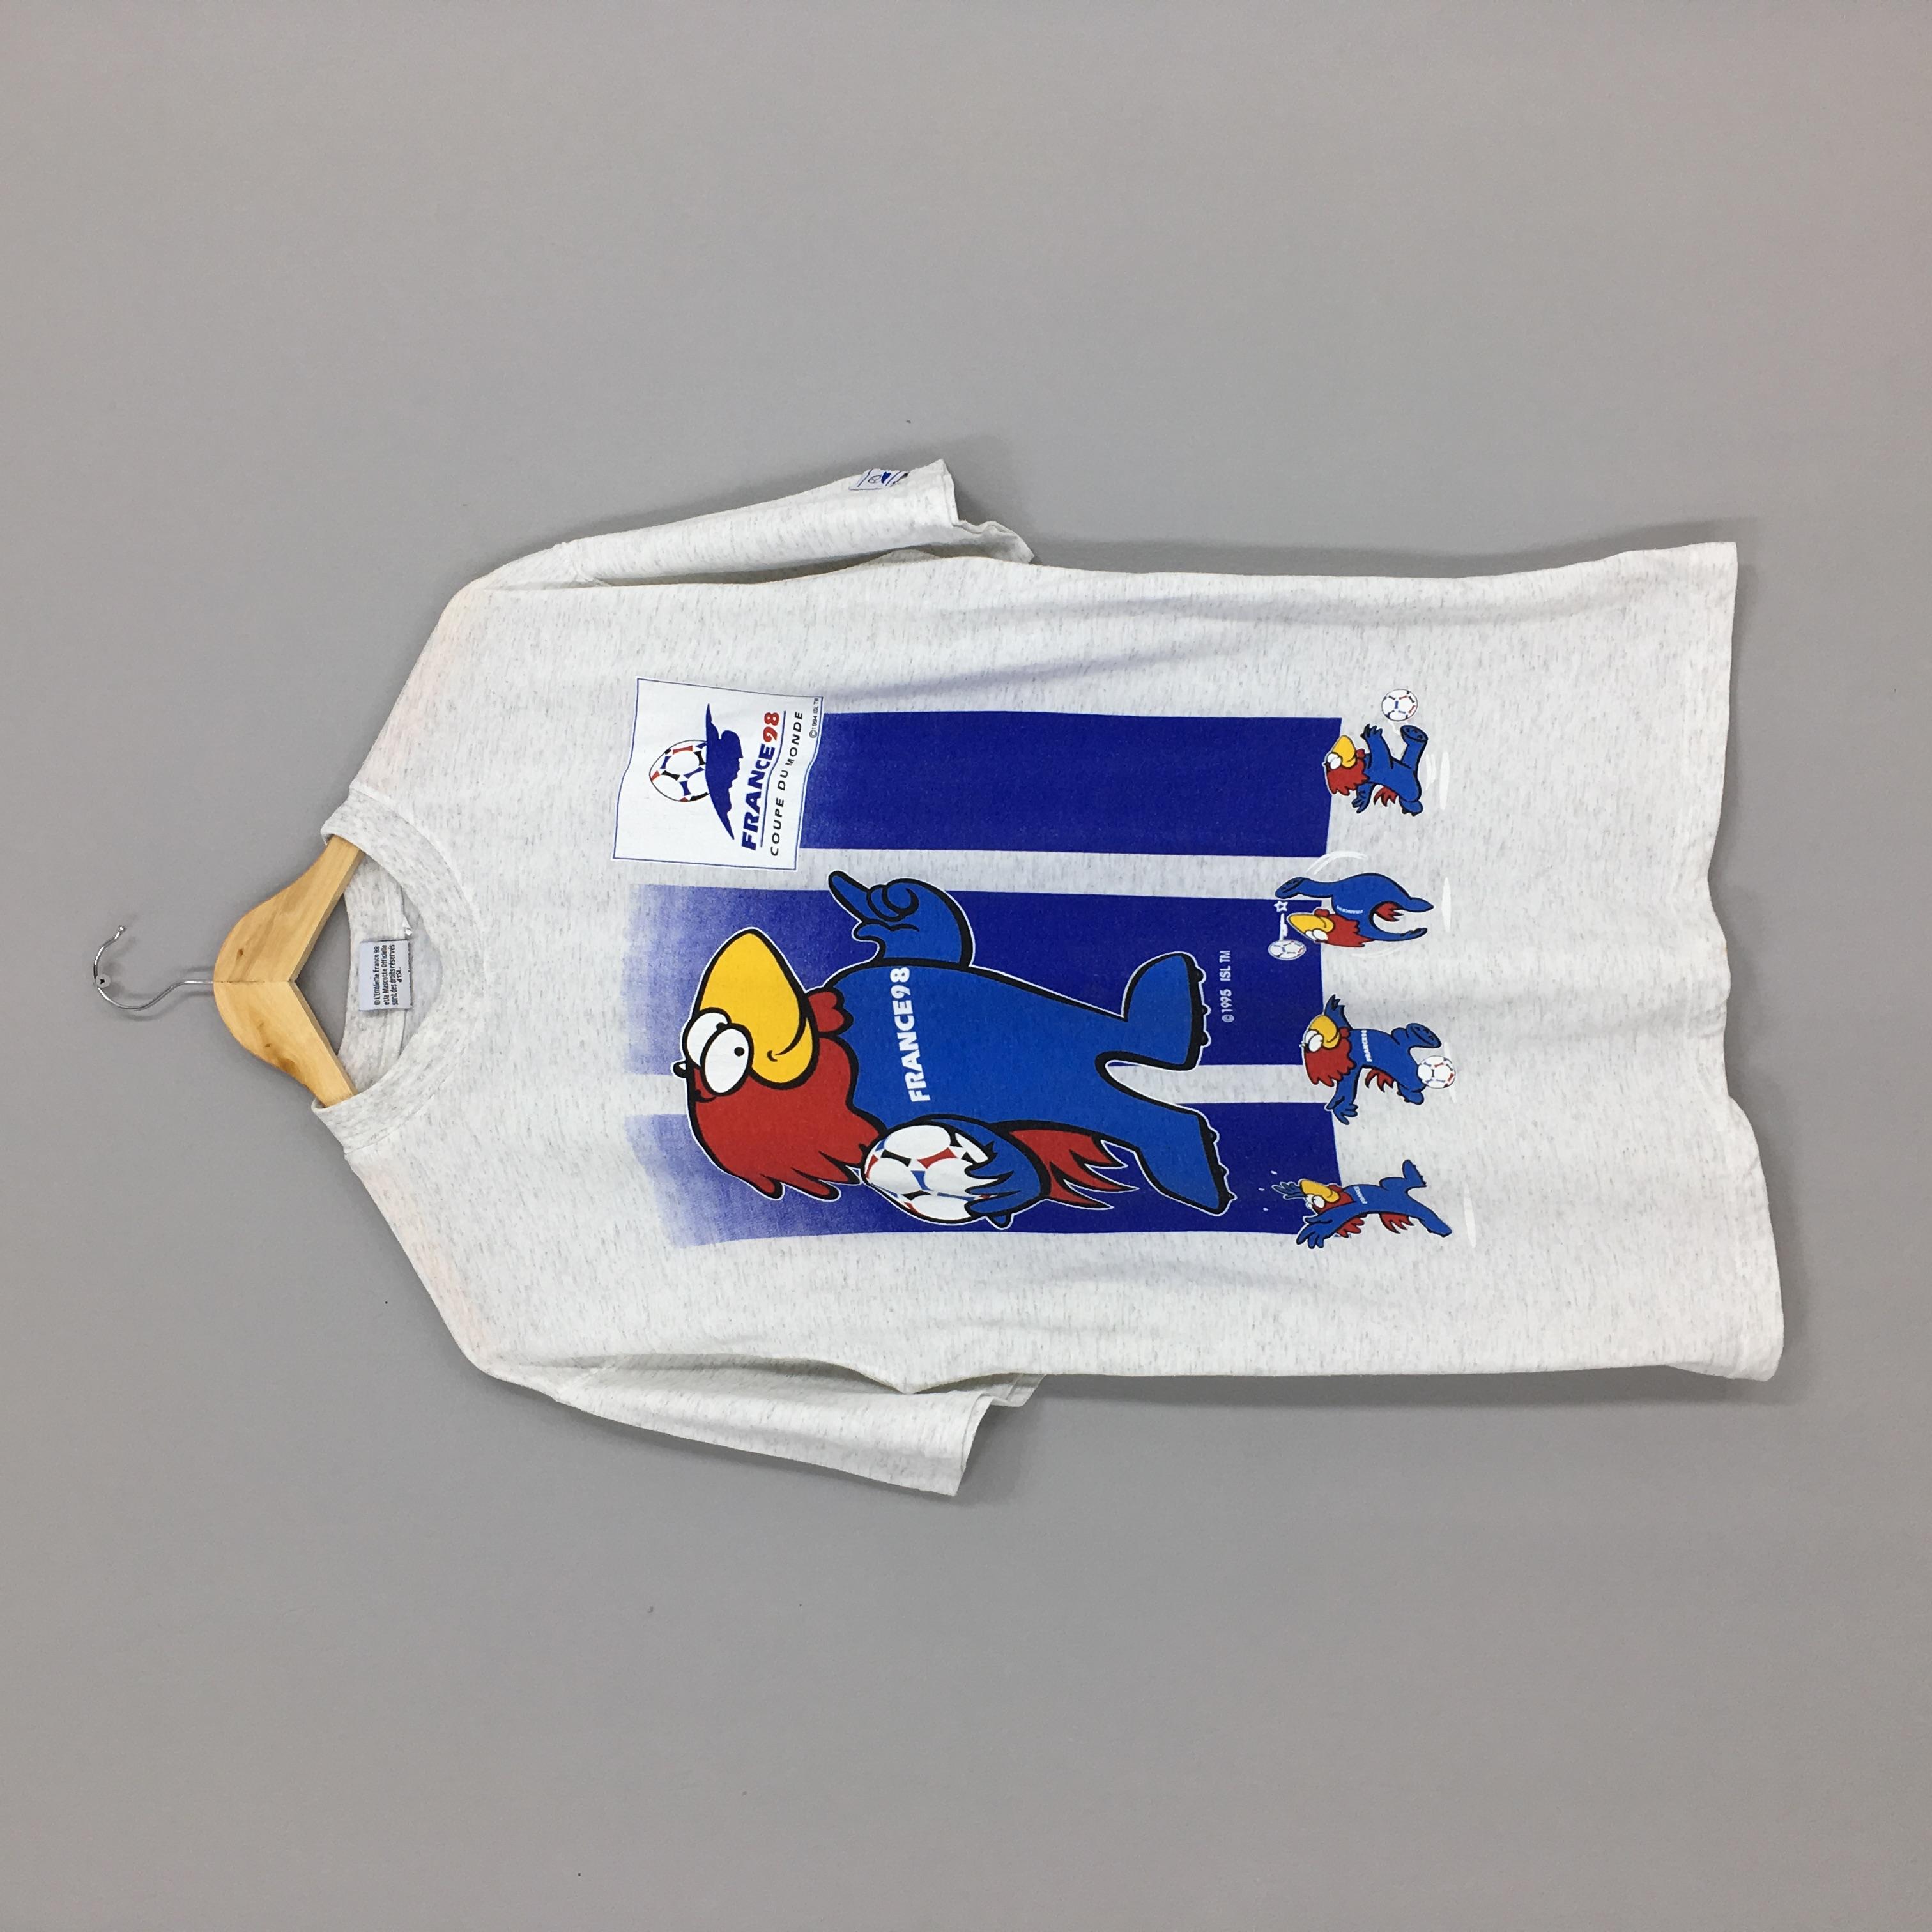 Rare !! Vintage 90s Fifa World Cup 1998 France Crewneck T-Shirt vtg Football Sportwear Fashion Style Streetwear Shirt Extra Large Size